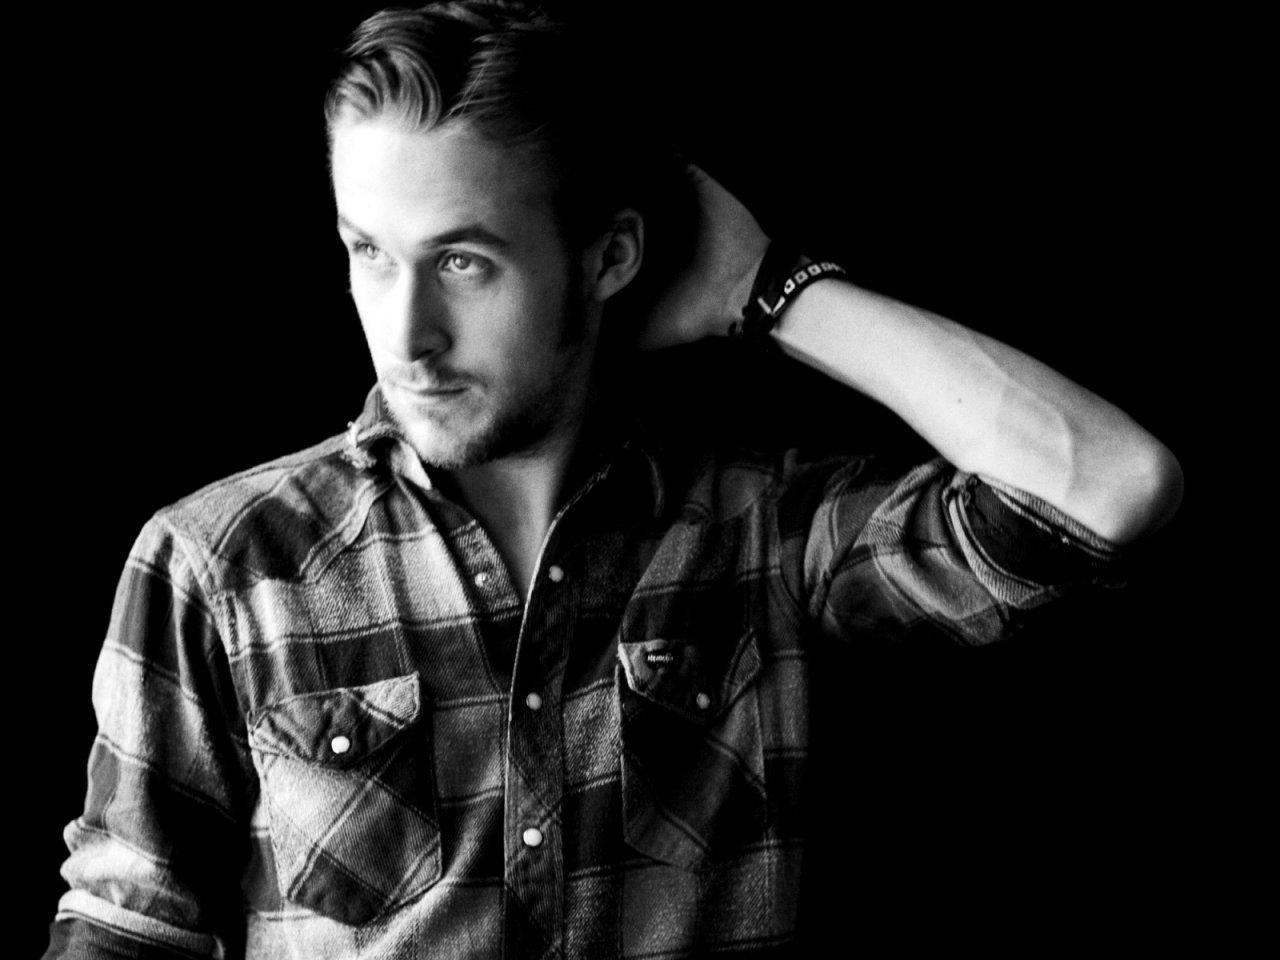 Ryan Gosling Wallpaper Maceme Wallpaper 1280x960